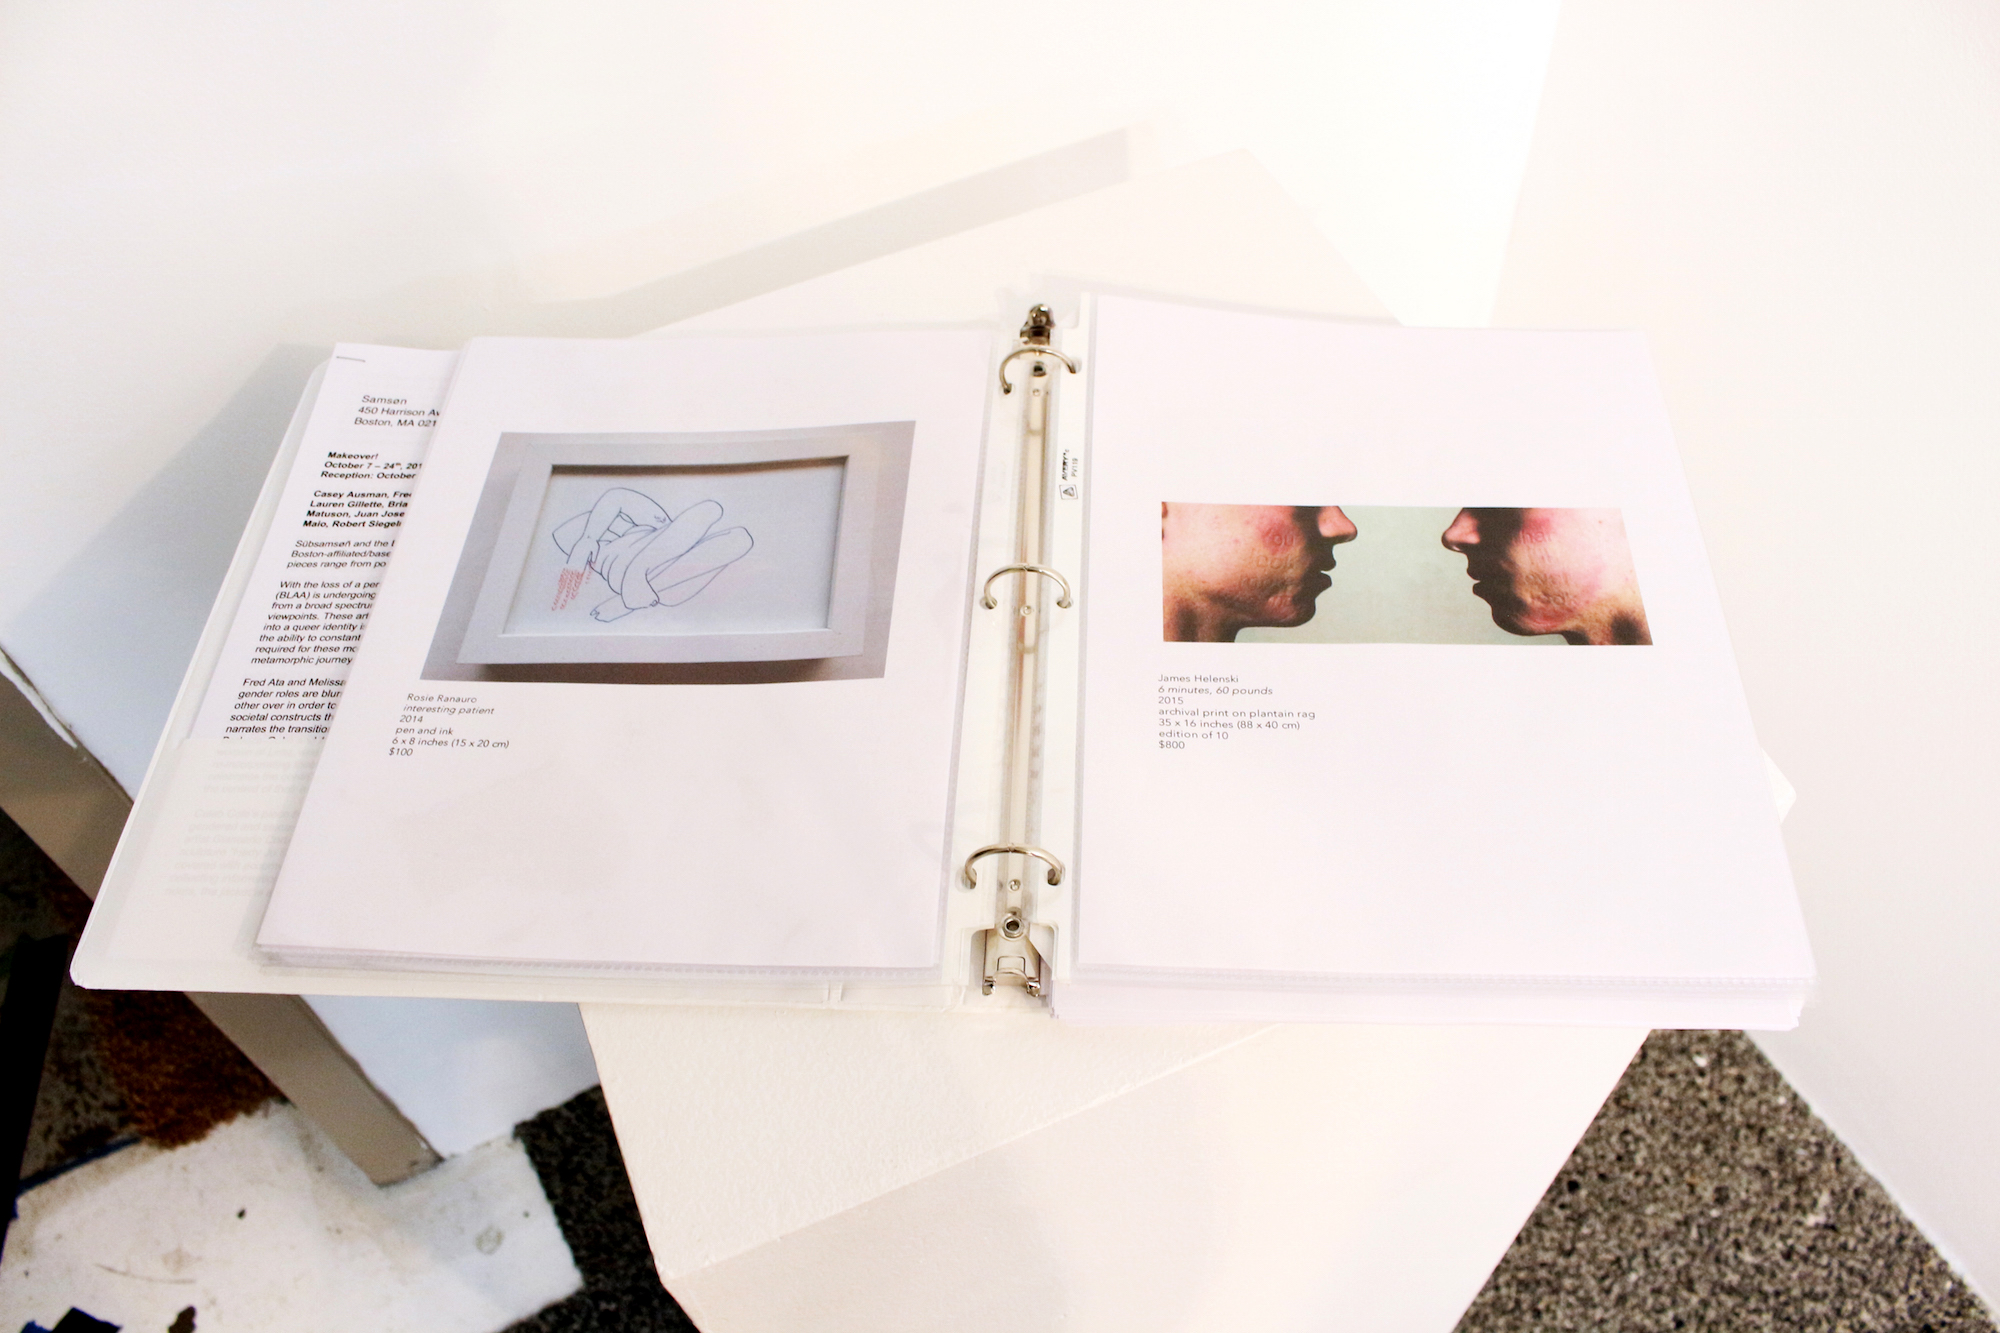 BLAA x Subsamson Makeover! show portfolio, featuring works of (left) Rosie Ranauro and (right) James Helenski.